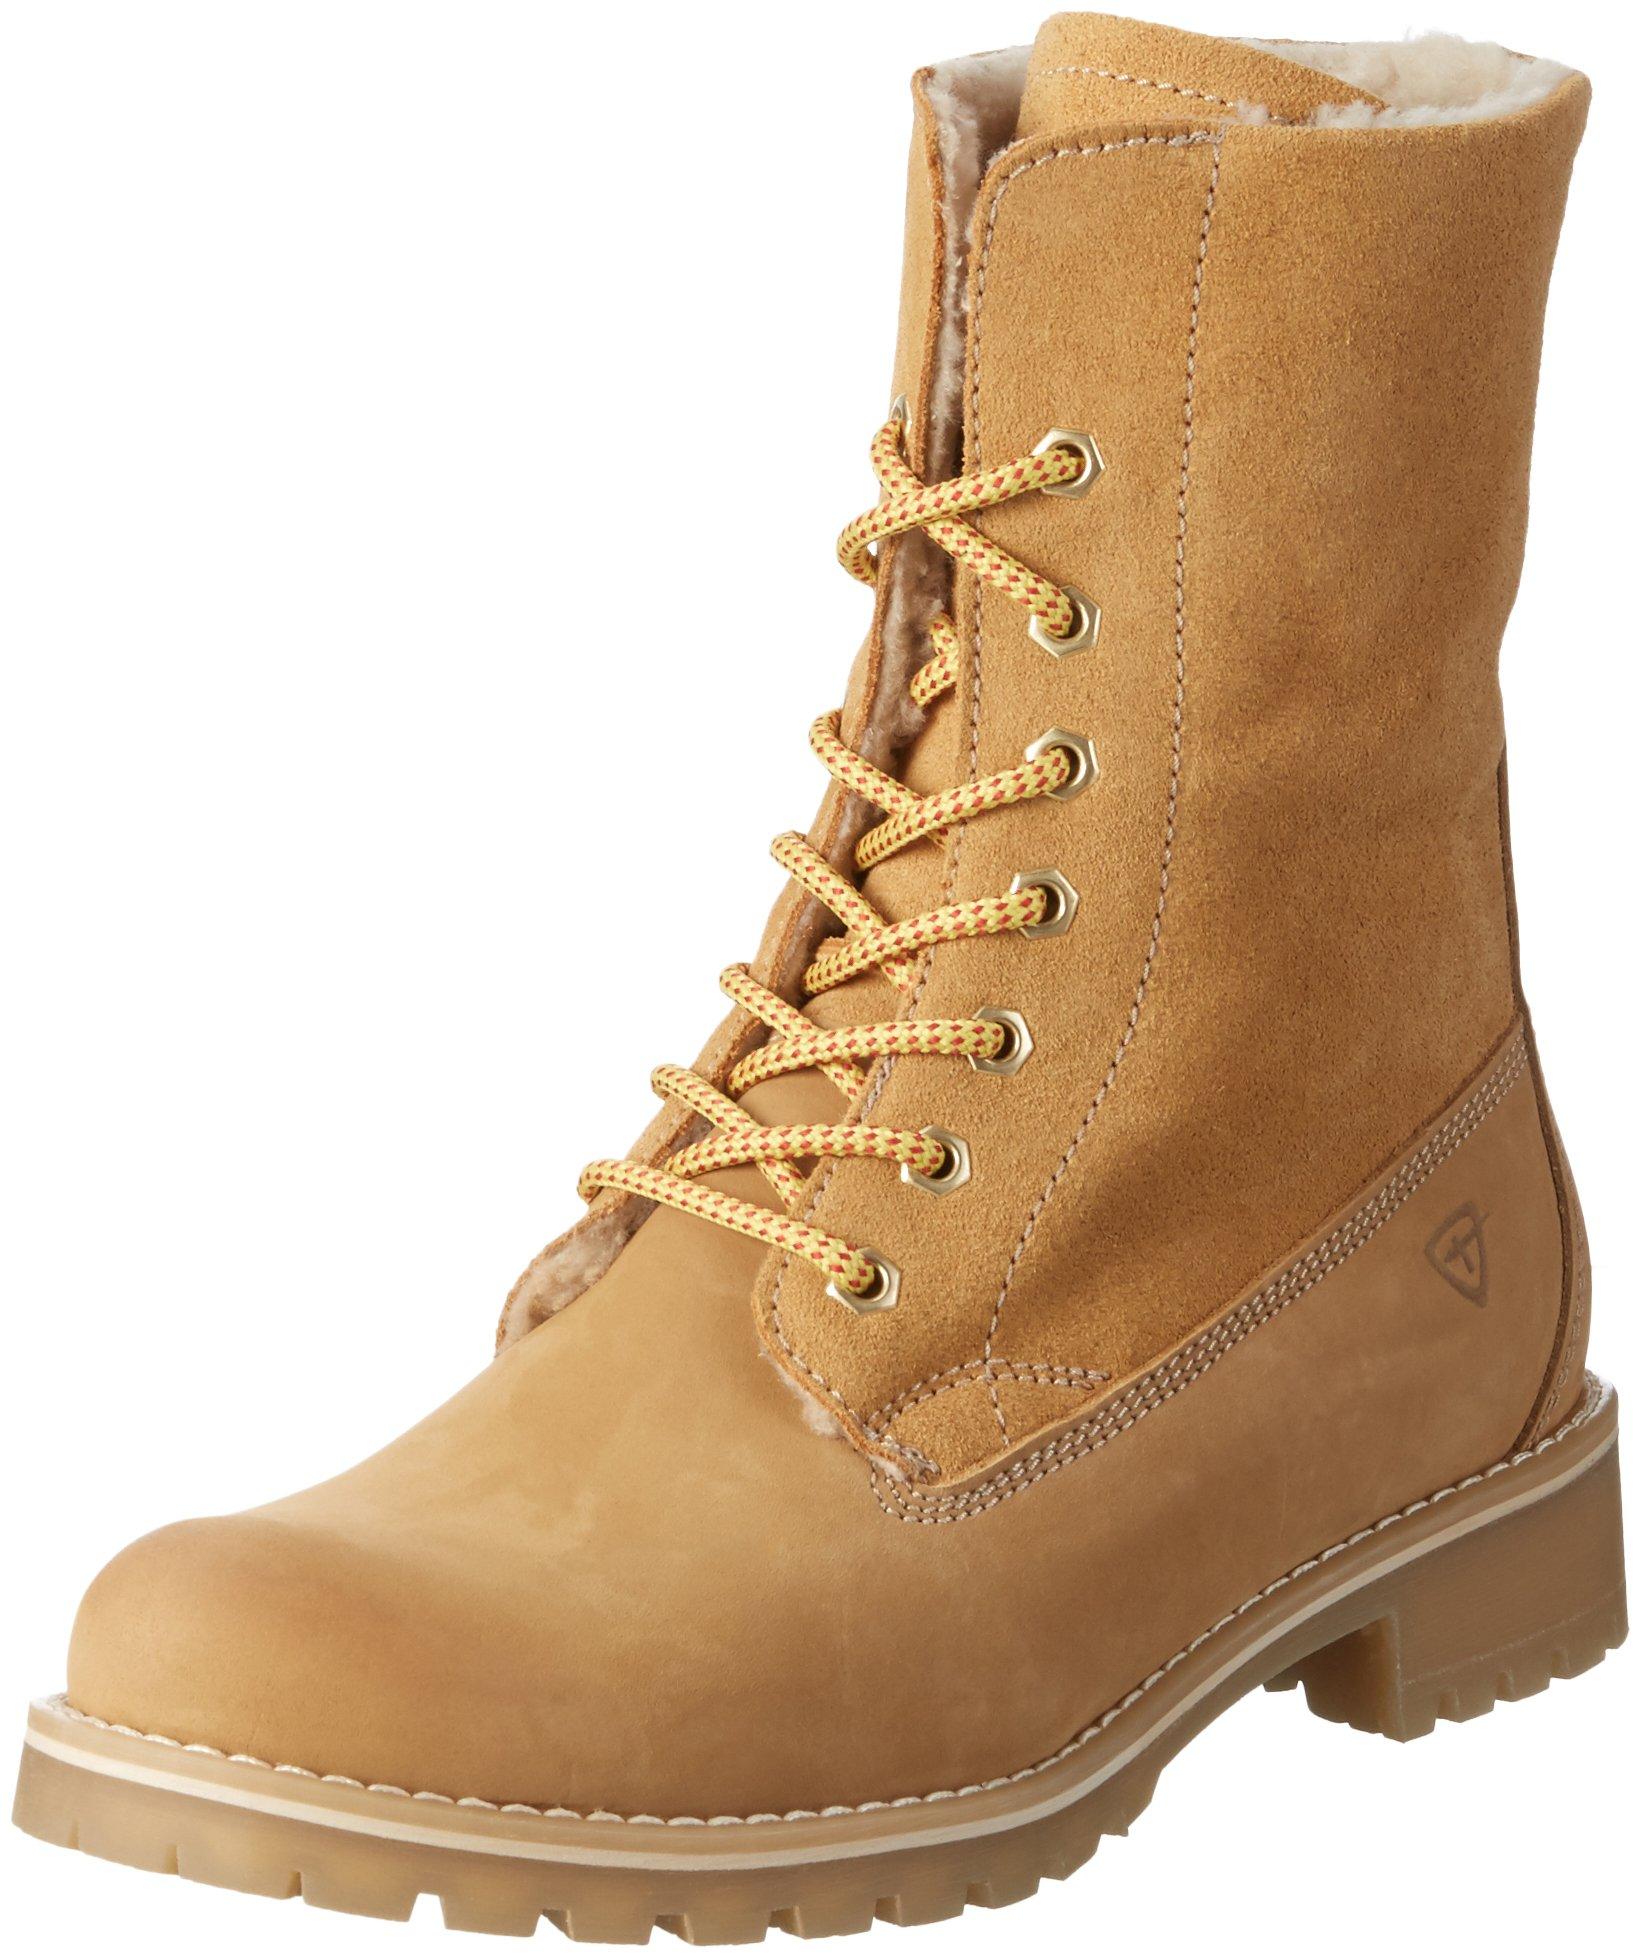 tamaris women 39 s 264 combat boots yellow corn 610 9 uk. Black Bedroom Furniture Sets. Home Design Ideas